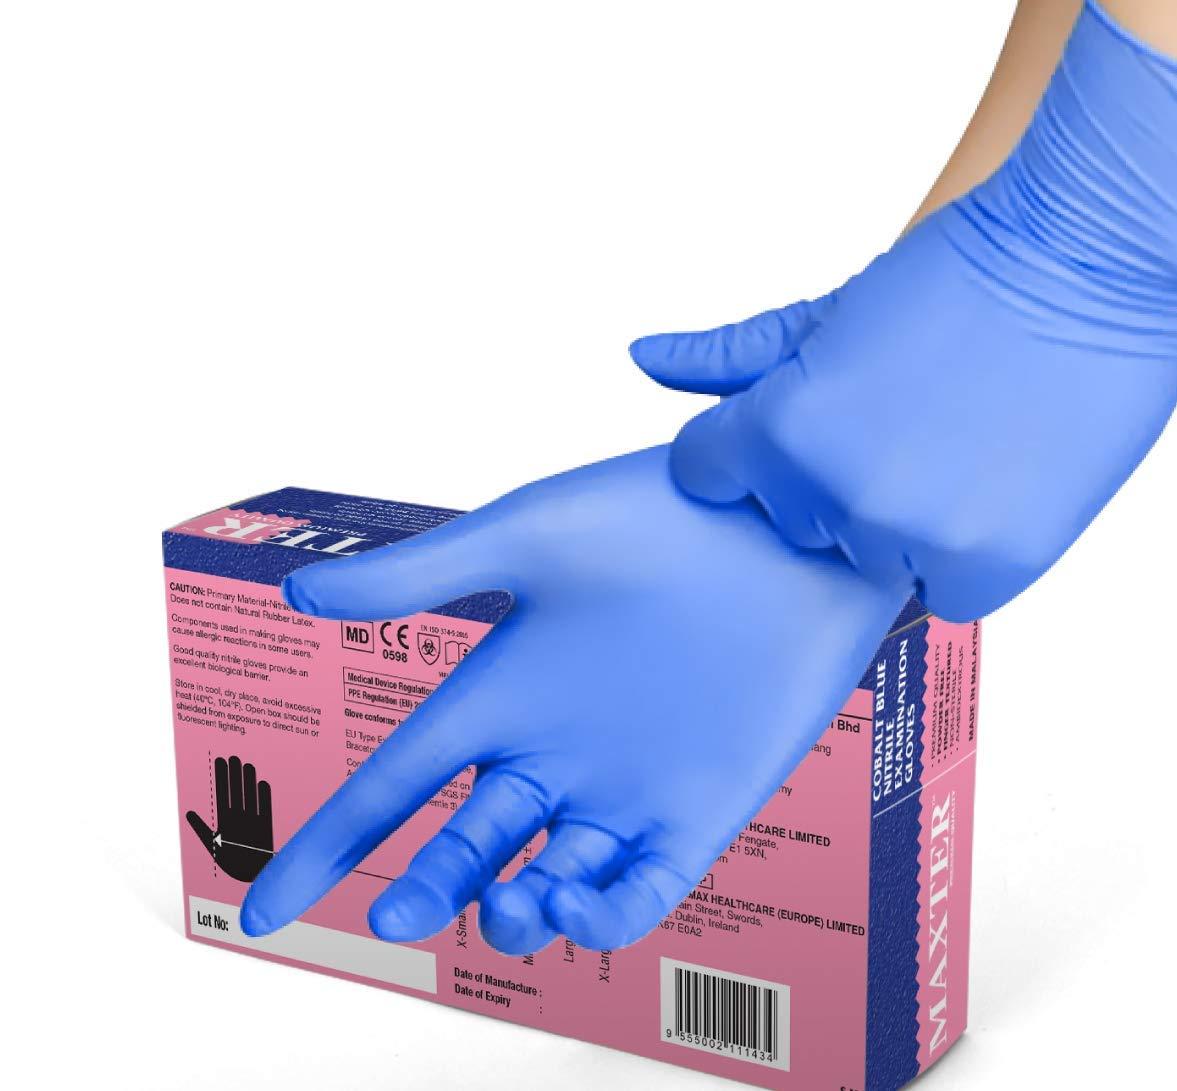 VENSALUD Caja de 100 guantes L Color: Azul Sin Polvo Guantes de nitrilo desechables